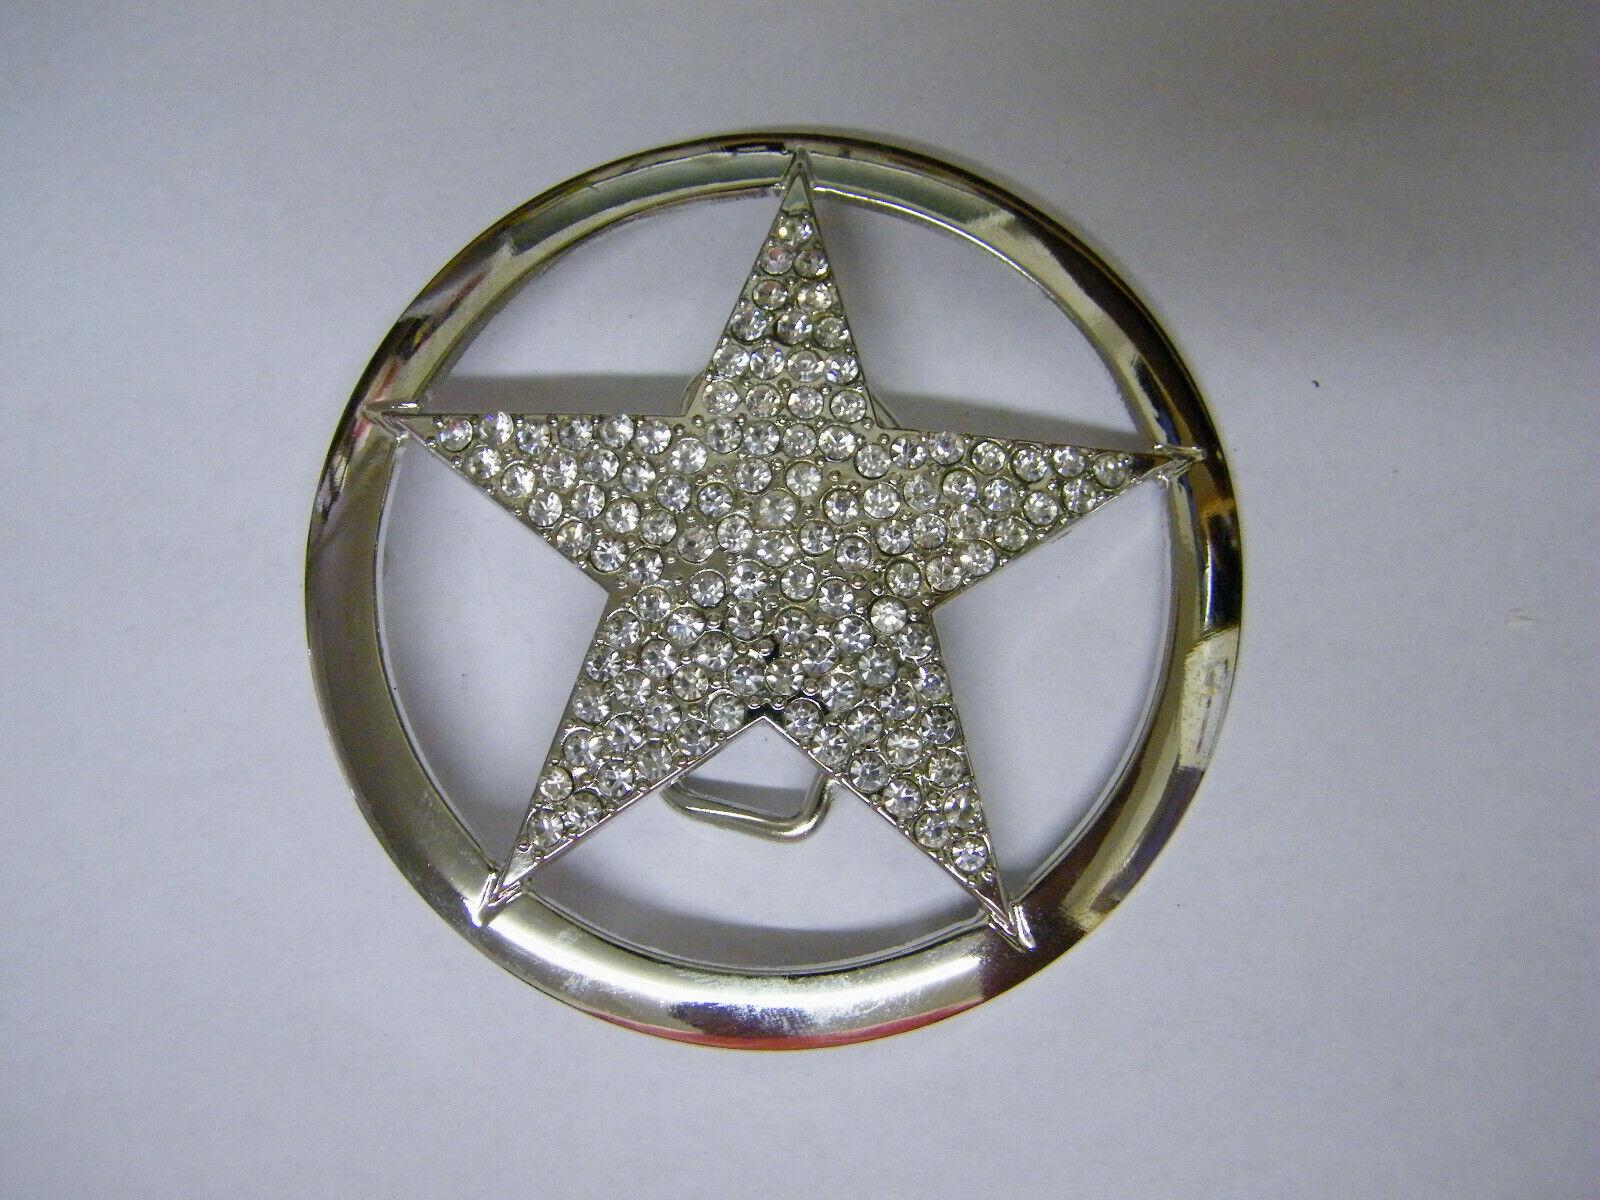 Silver Colored Star w/Rhinestones Belt Buckle #2